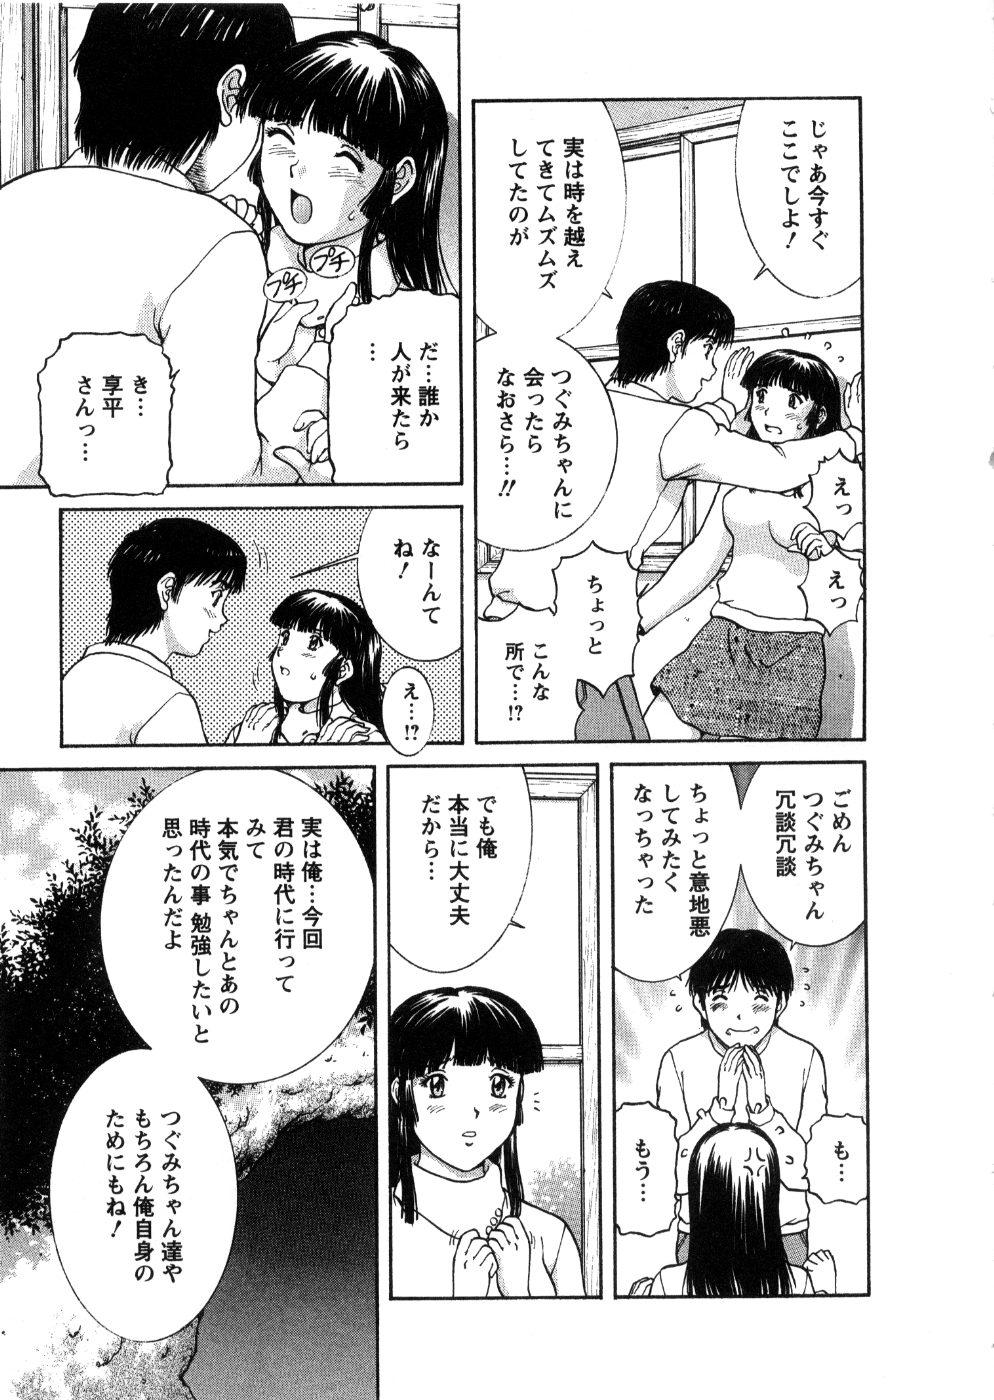 Oneechan-tachi ga Yatte Kuru 03 60